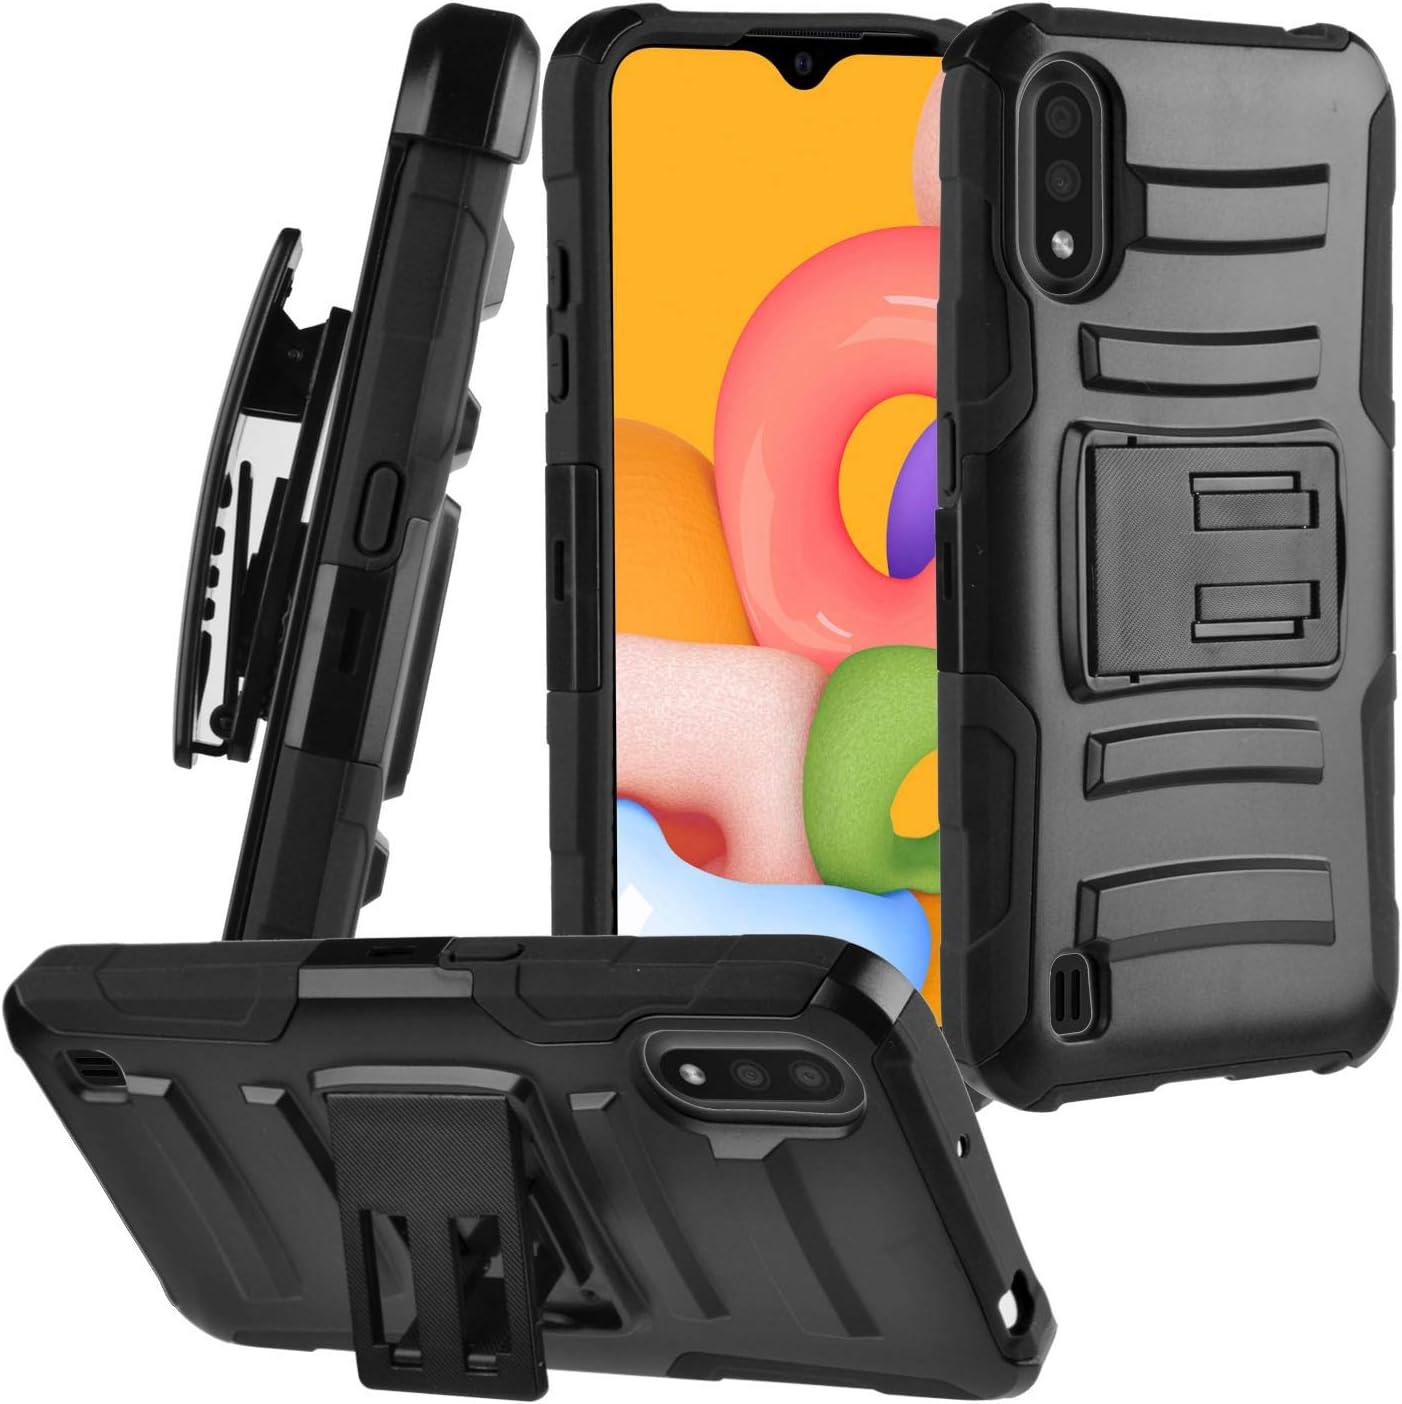 CELZEN - for Samsung Galaxy A01 SM-A015 - Hybrid Phone Case w/Stand/Belt Clip Holster - CV1 Black